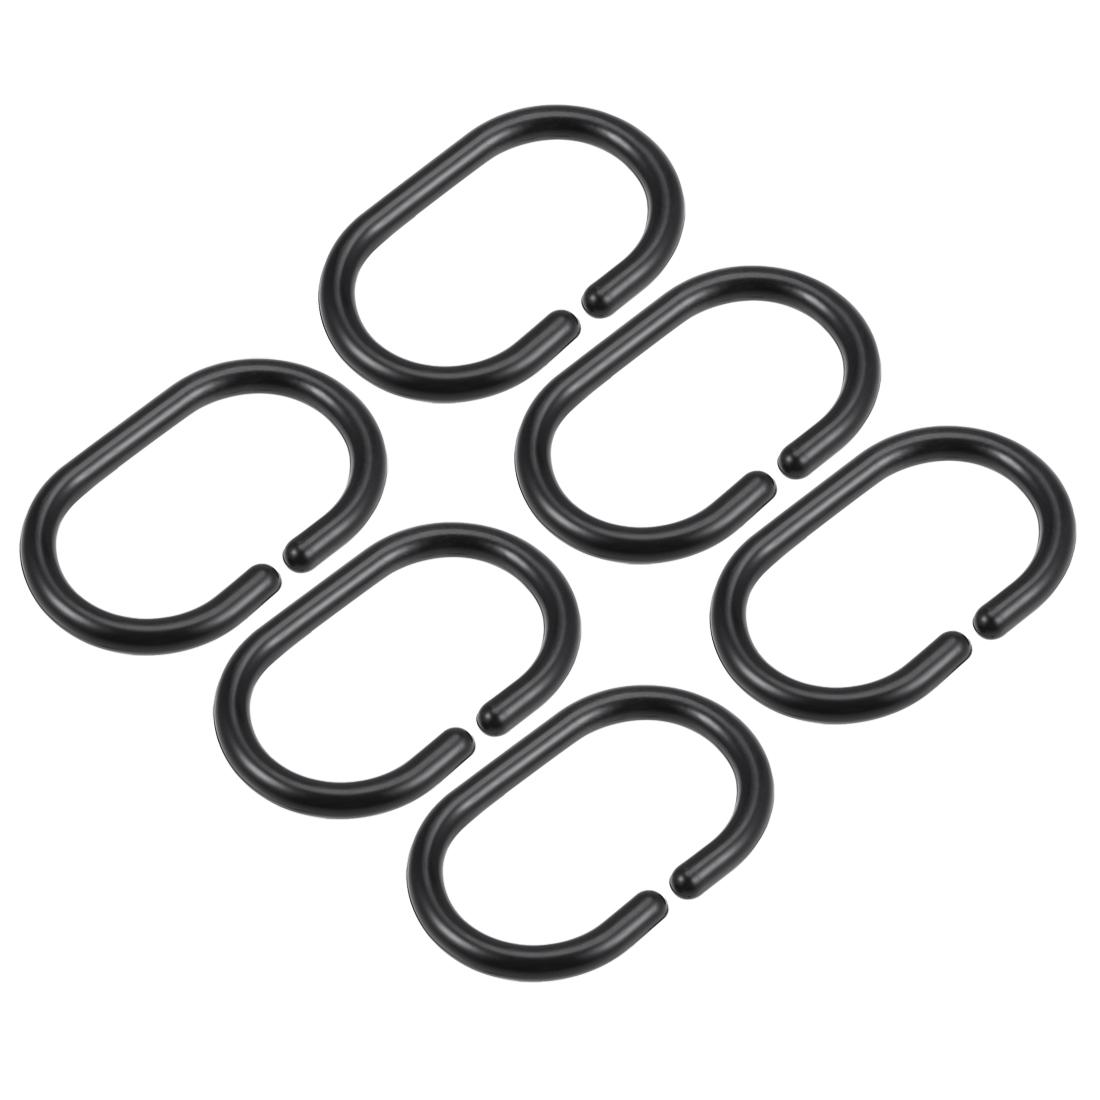 Shower Curtain Rings Plastic Hooks for Bathroom Drape Rod Black 6 Pcs